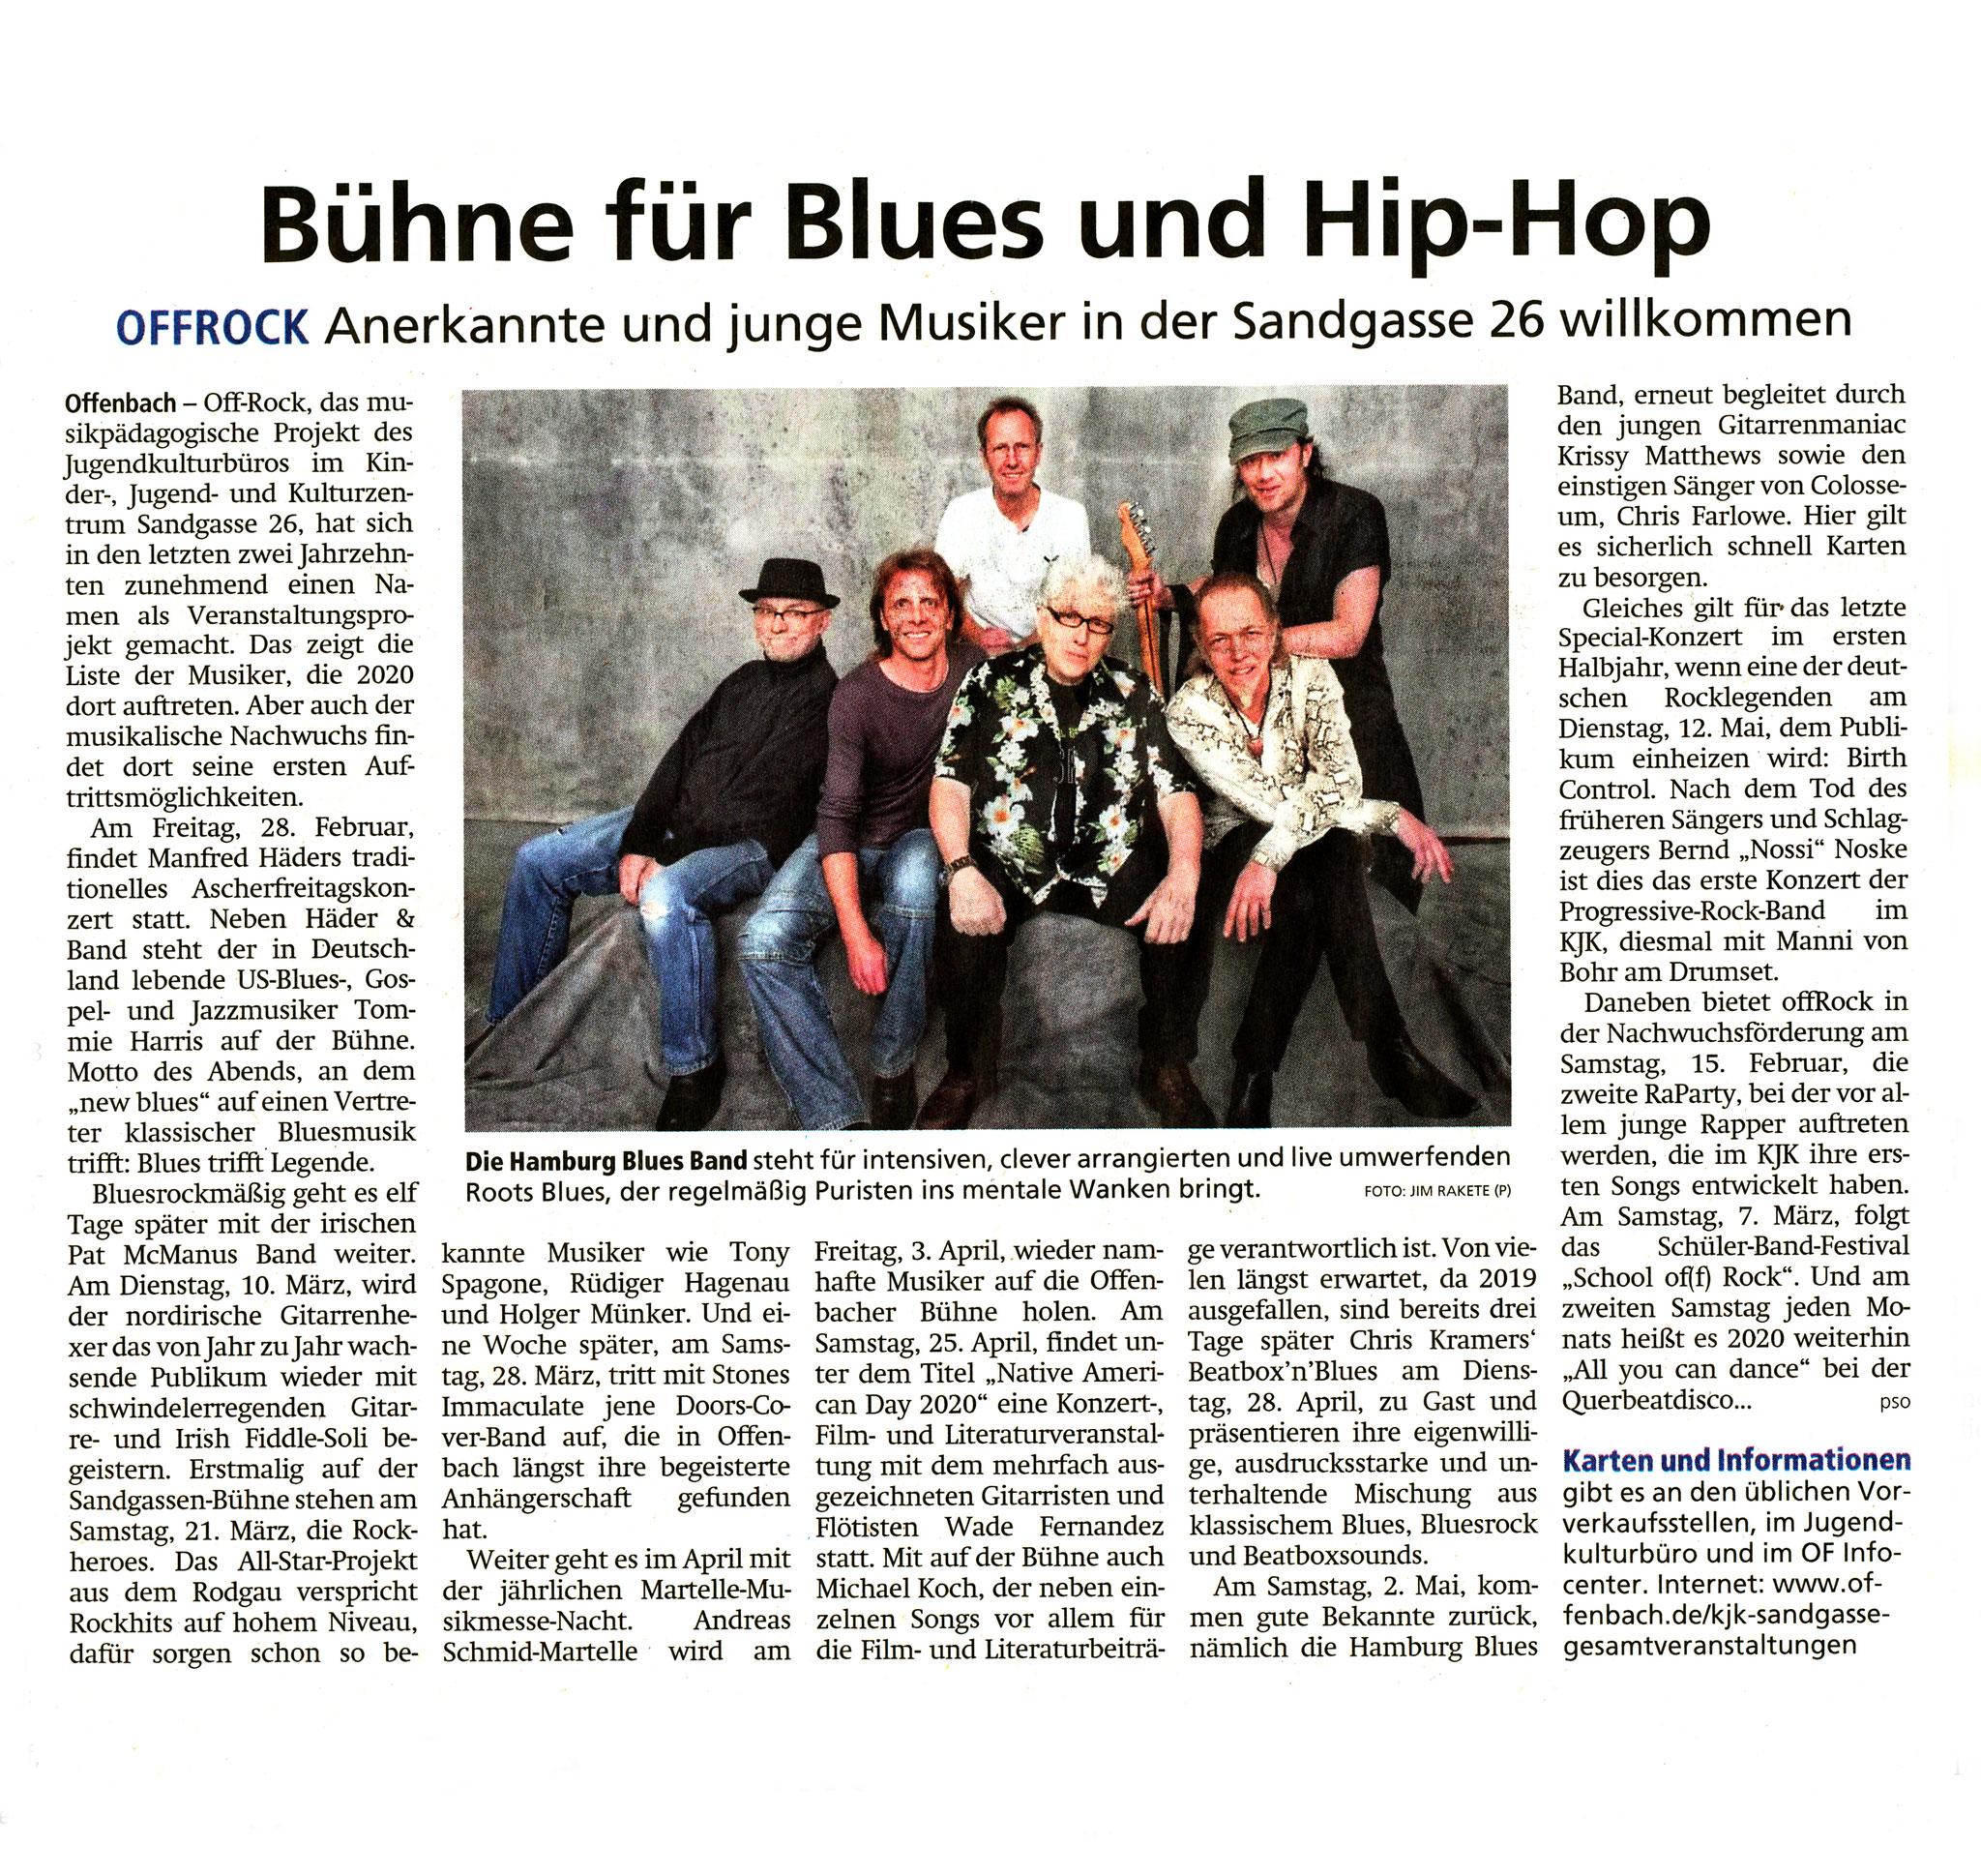 Offenbach Post 29. Januar 2020